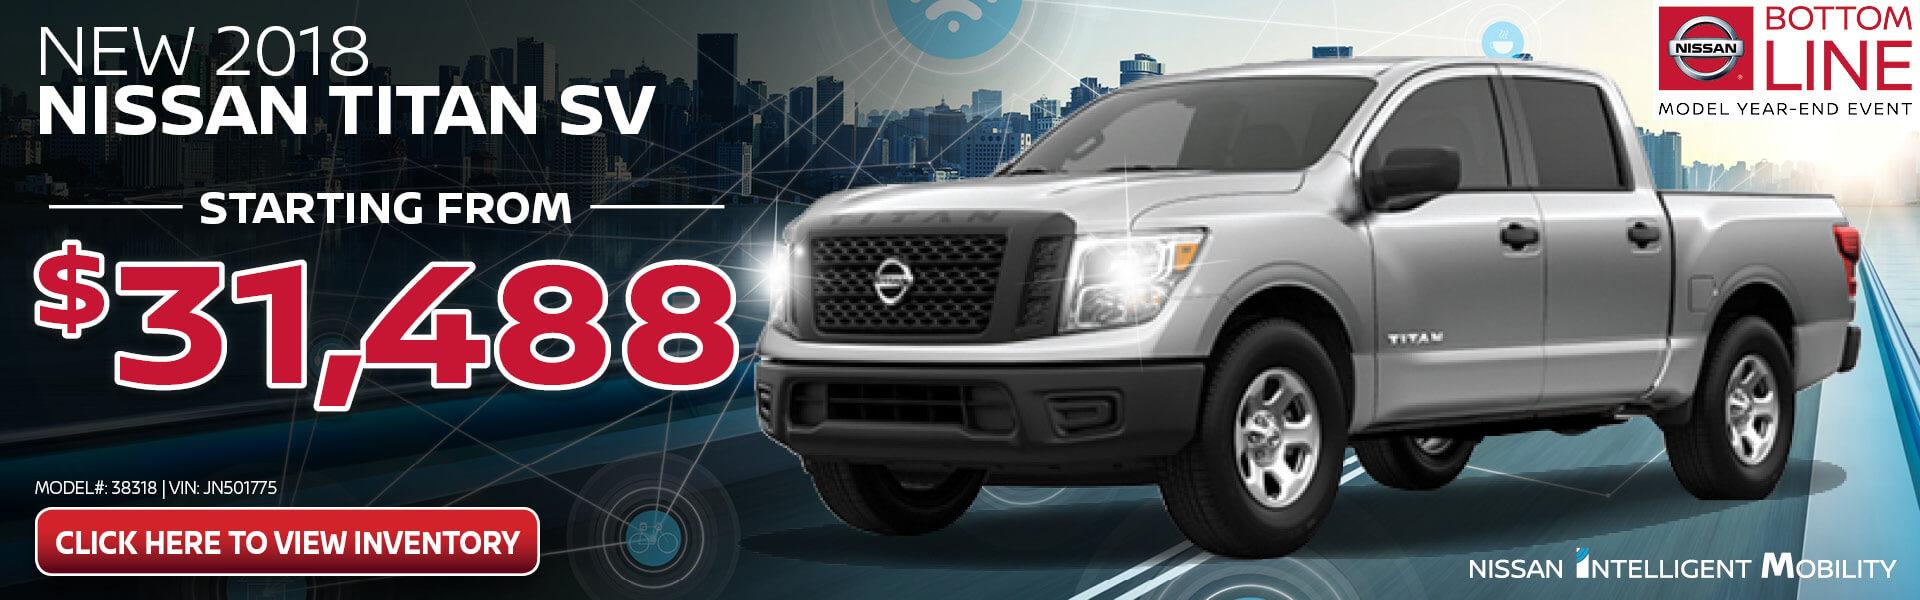 Nissan Titan $31,488 Purchase